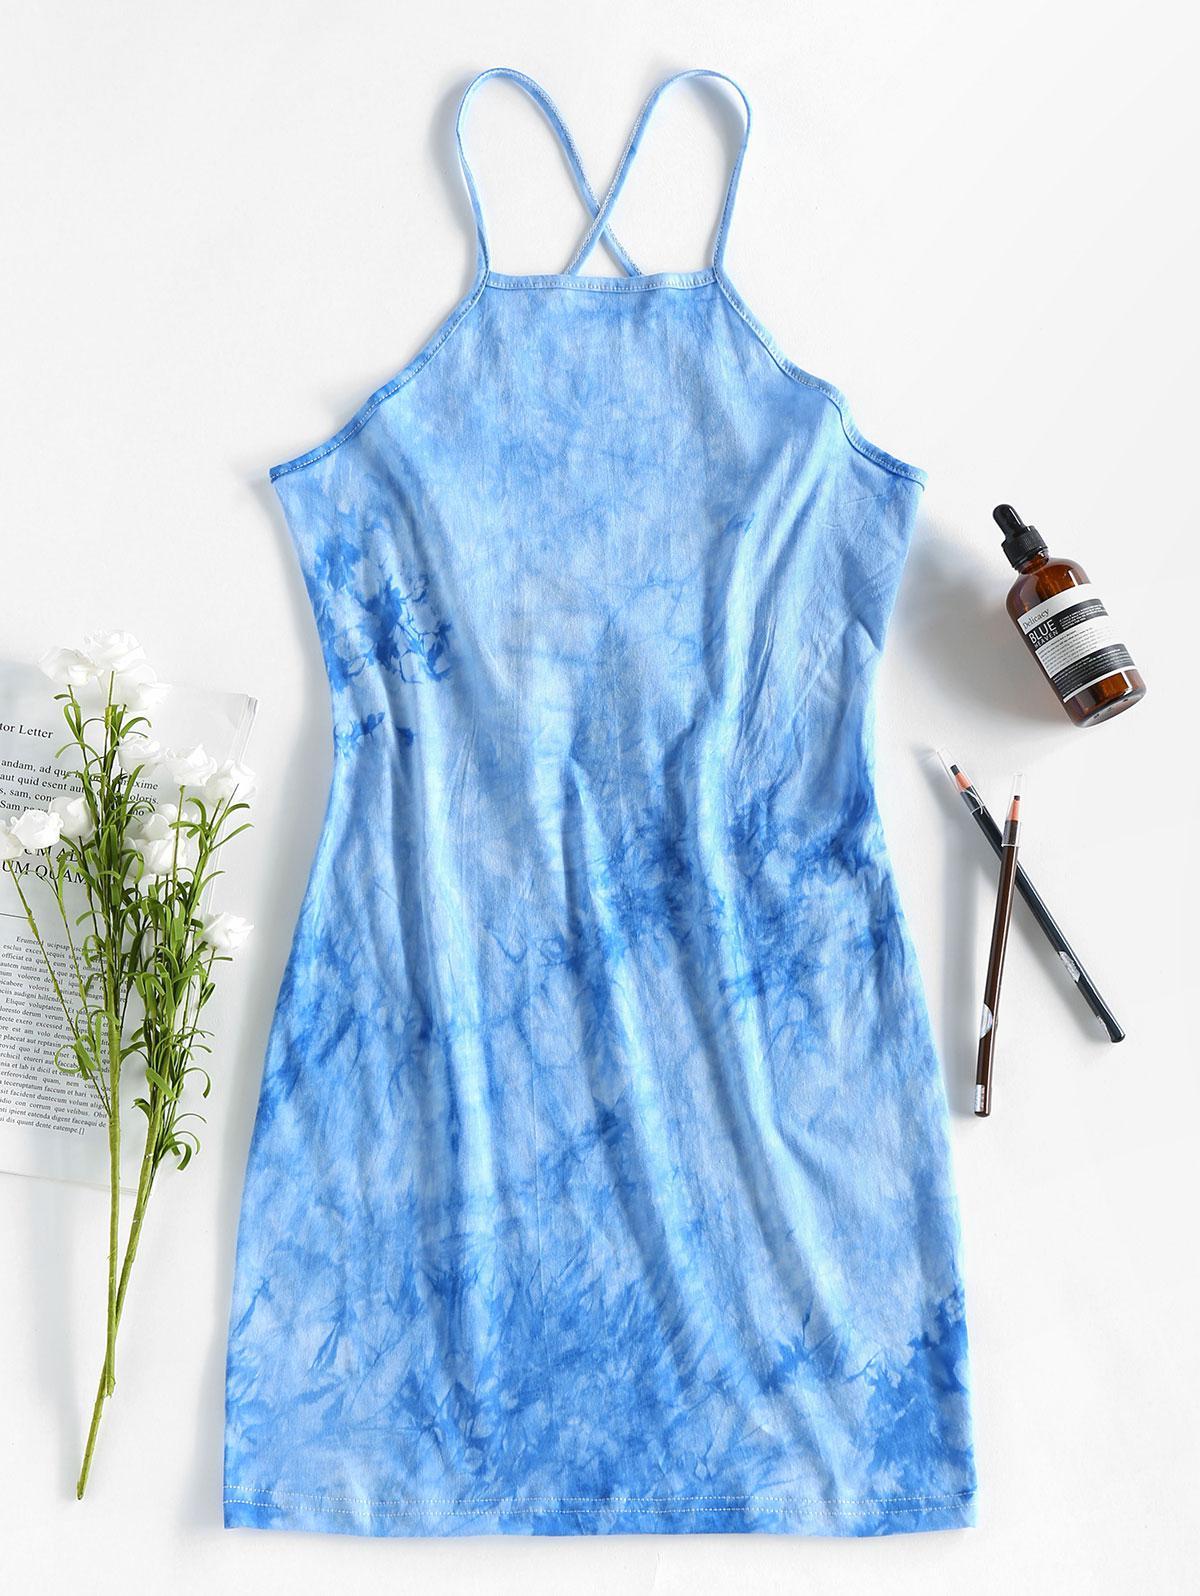 ZAFUL Lace Up Tie Dye Mini Tight Dress